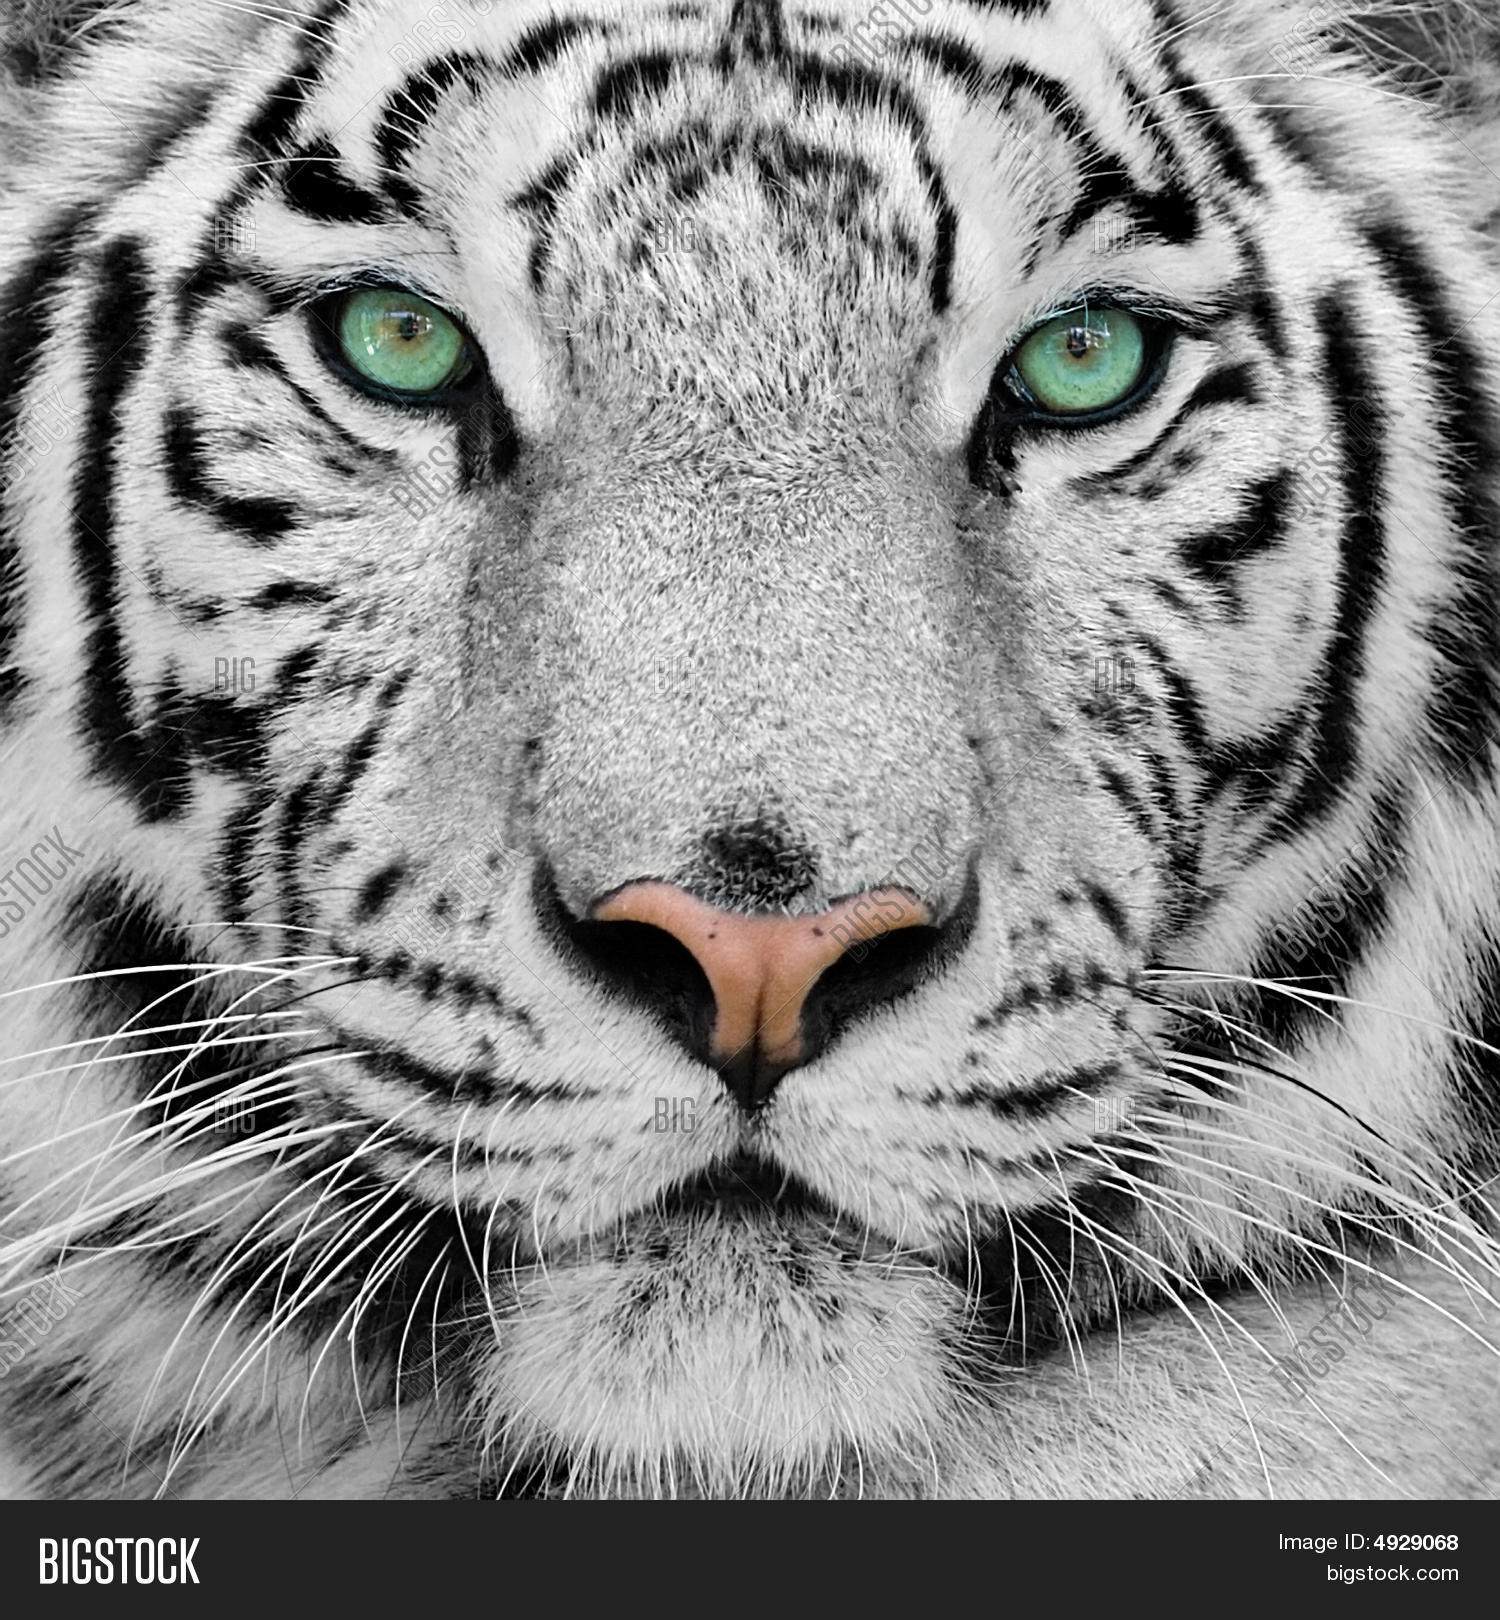 White Tiger Image & Photo | Bigstock